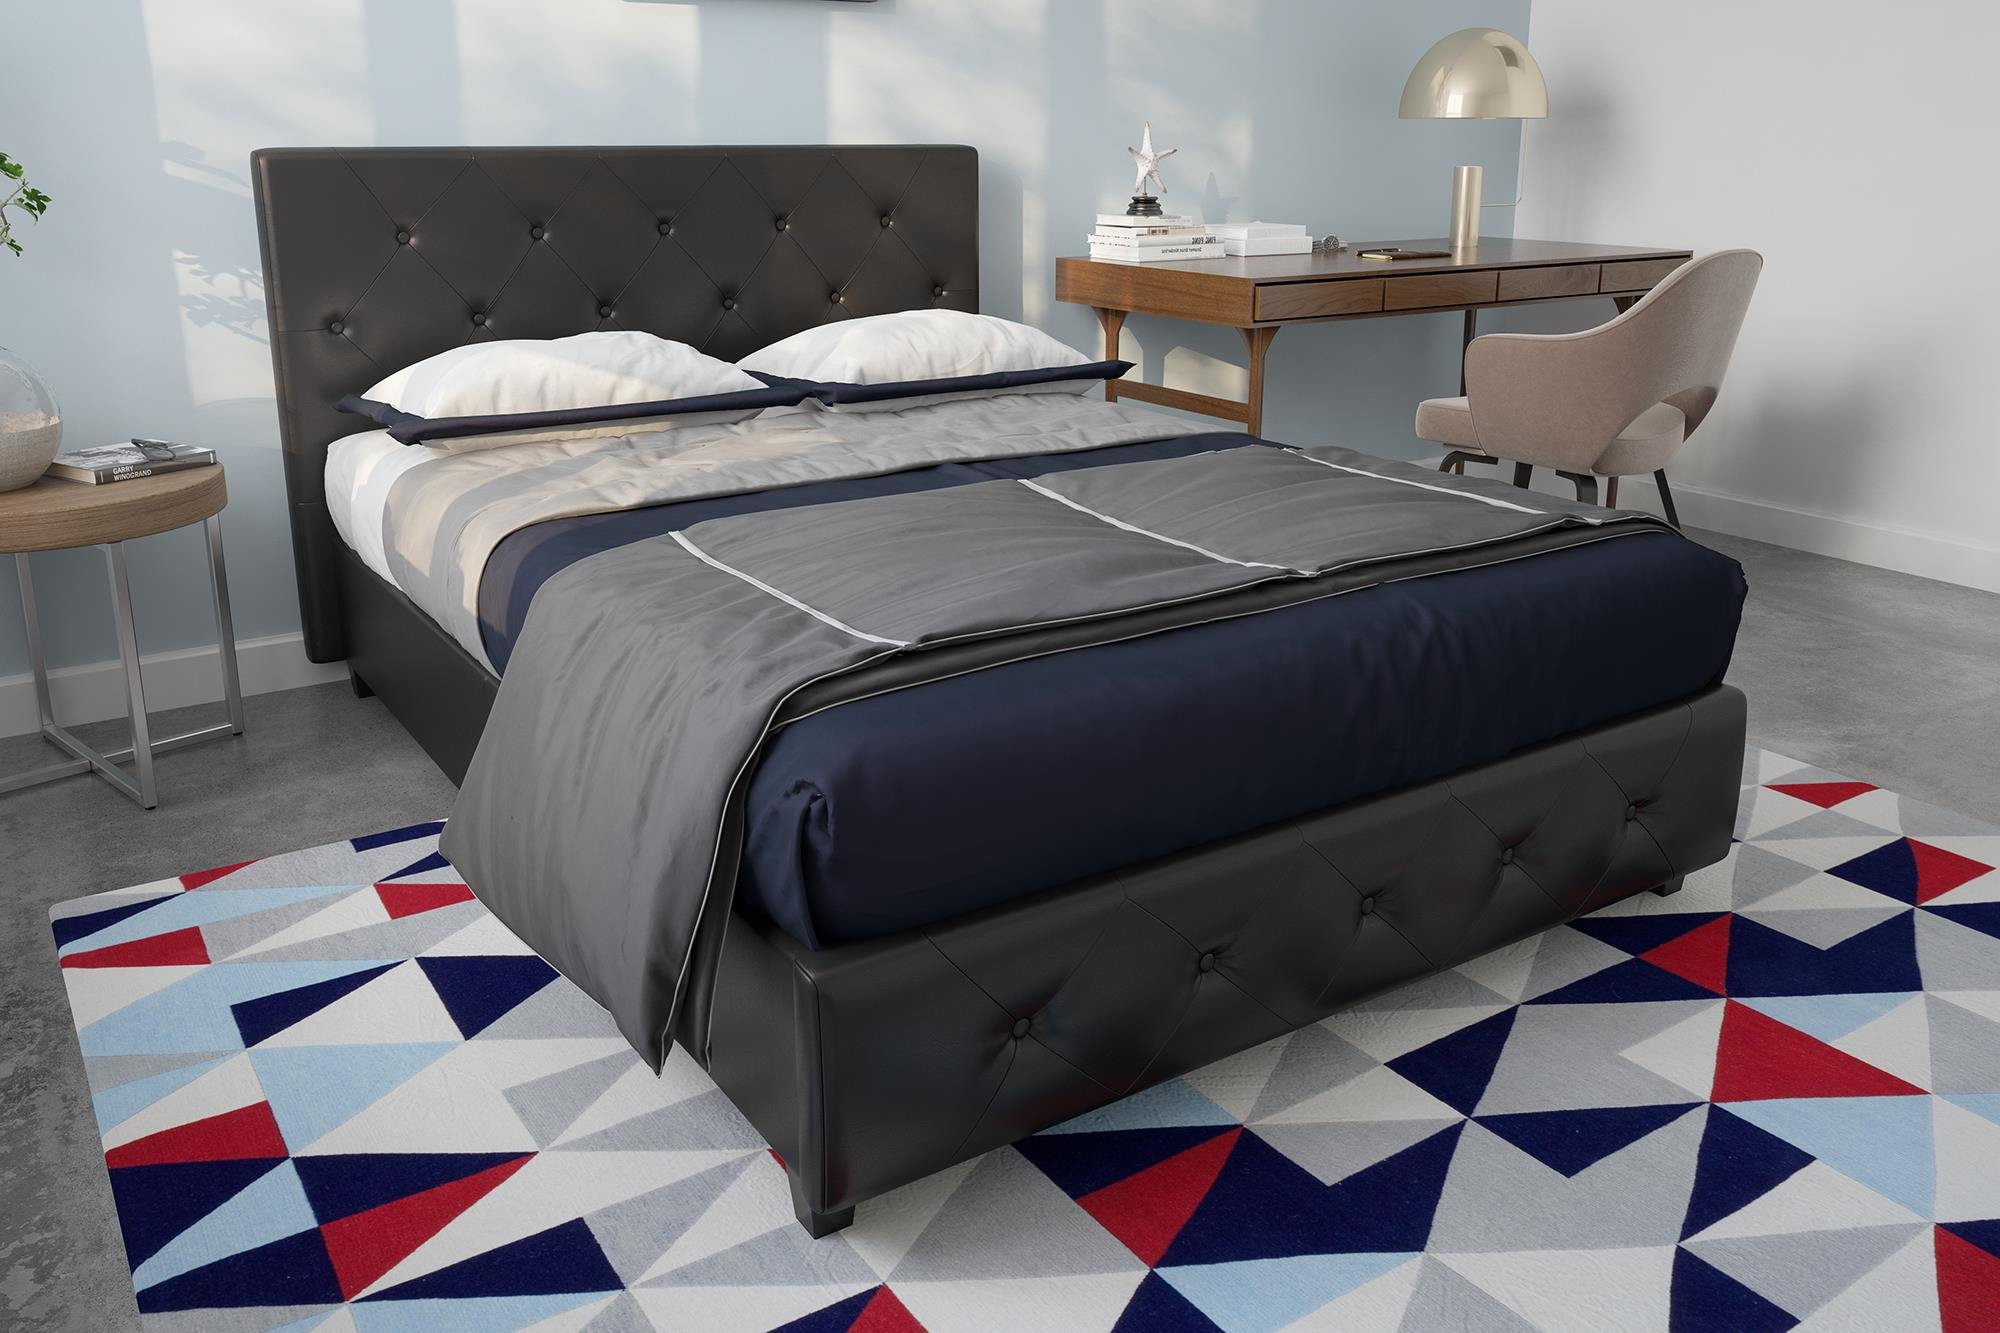 DHP Dakota Faux Leather Upholstered Platform Bed Frame with Signature Sleep Memoir 8-Inch Memory Foam Mattress Set, Full Size, Black